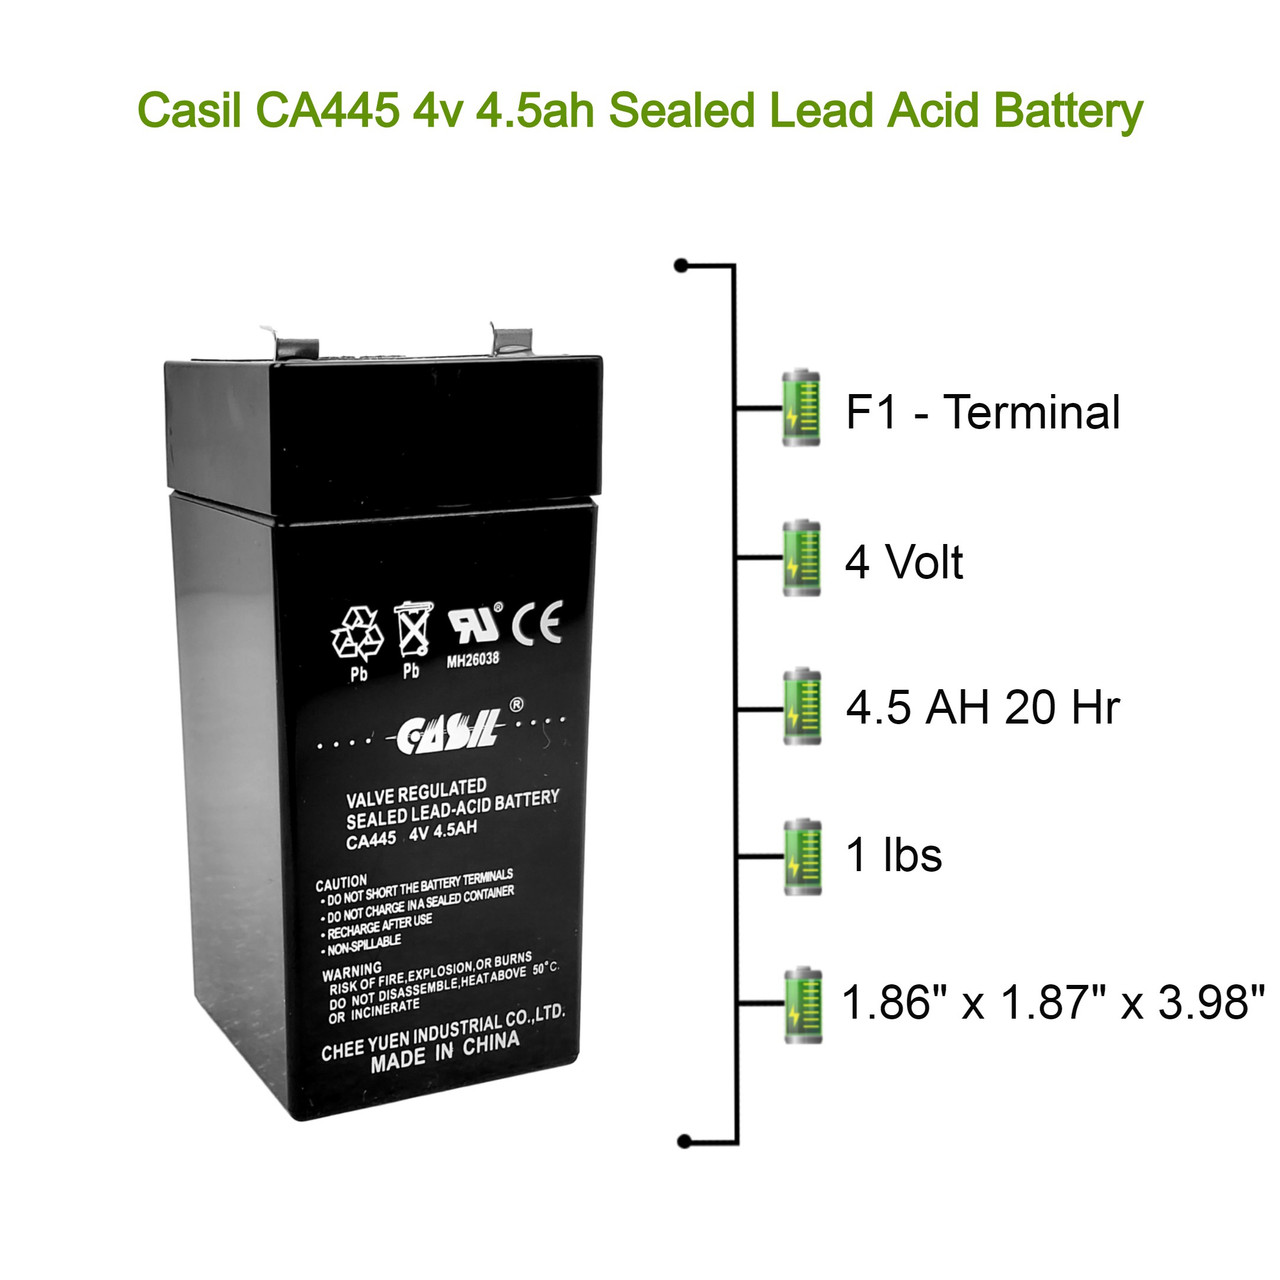 Casil CA445 4V 4.5AH for Fi-Shock SS-440, Zareba 2 Mile Fence Solar Charger AGM (Lead Acid) Battery